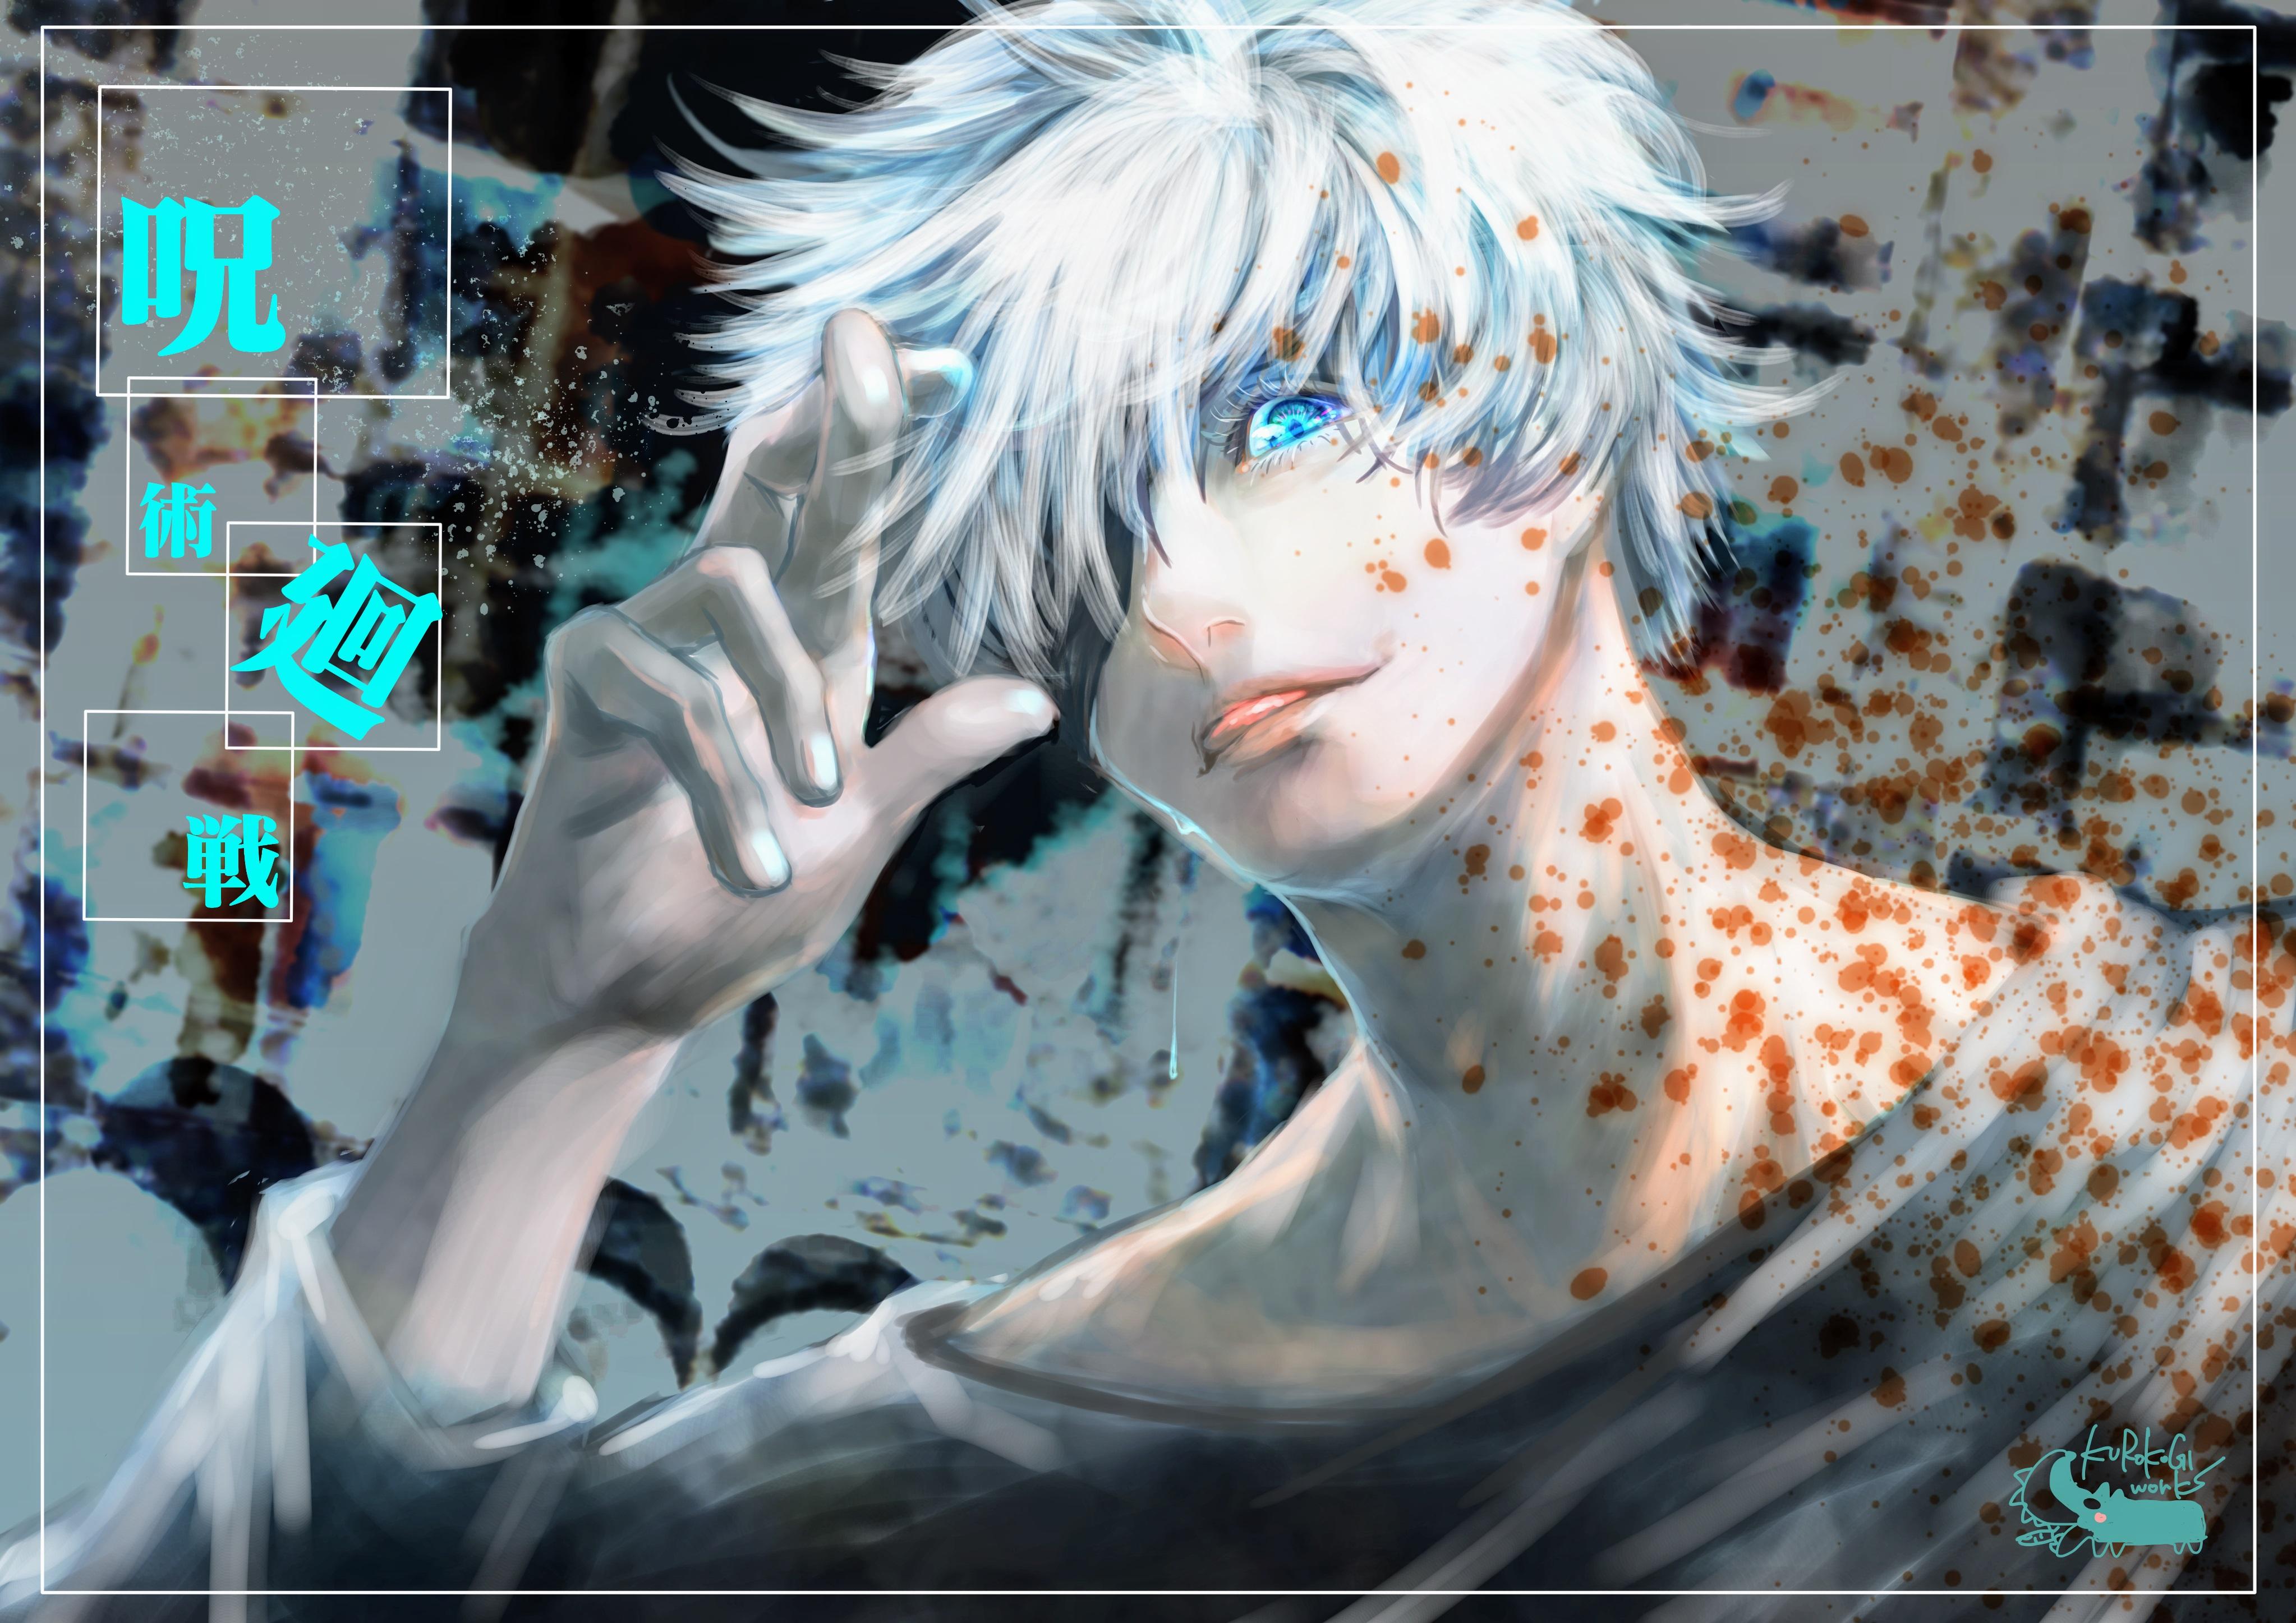 Find subcategories · anime jujutsu kaisen satoru gojo hd wallpaper | background image. Jujutsu Kaisen 4k Ultra HD Wallpaper | Background Image ...